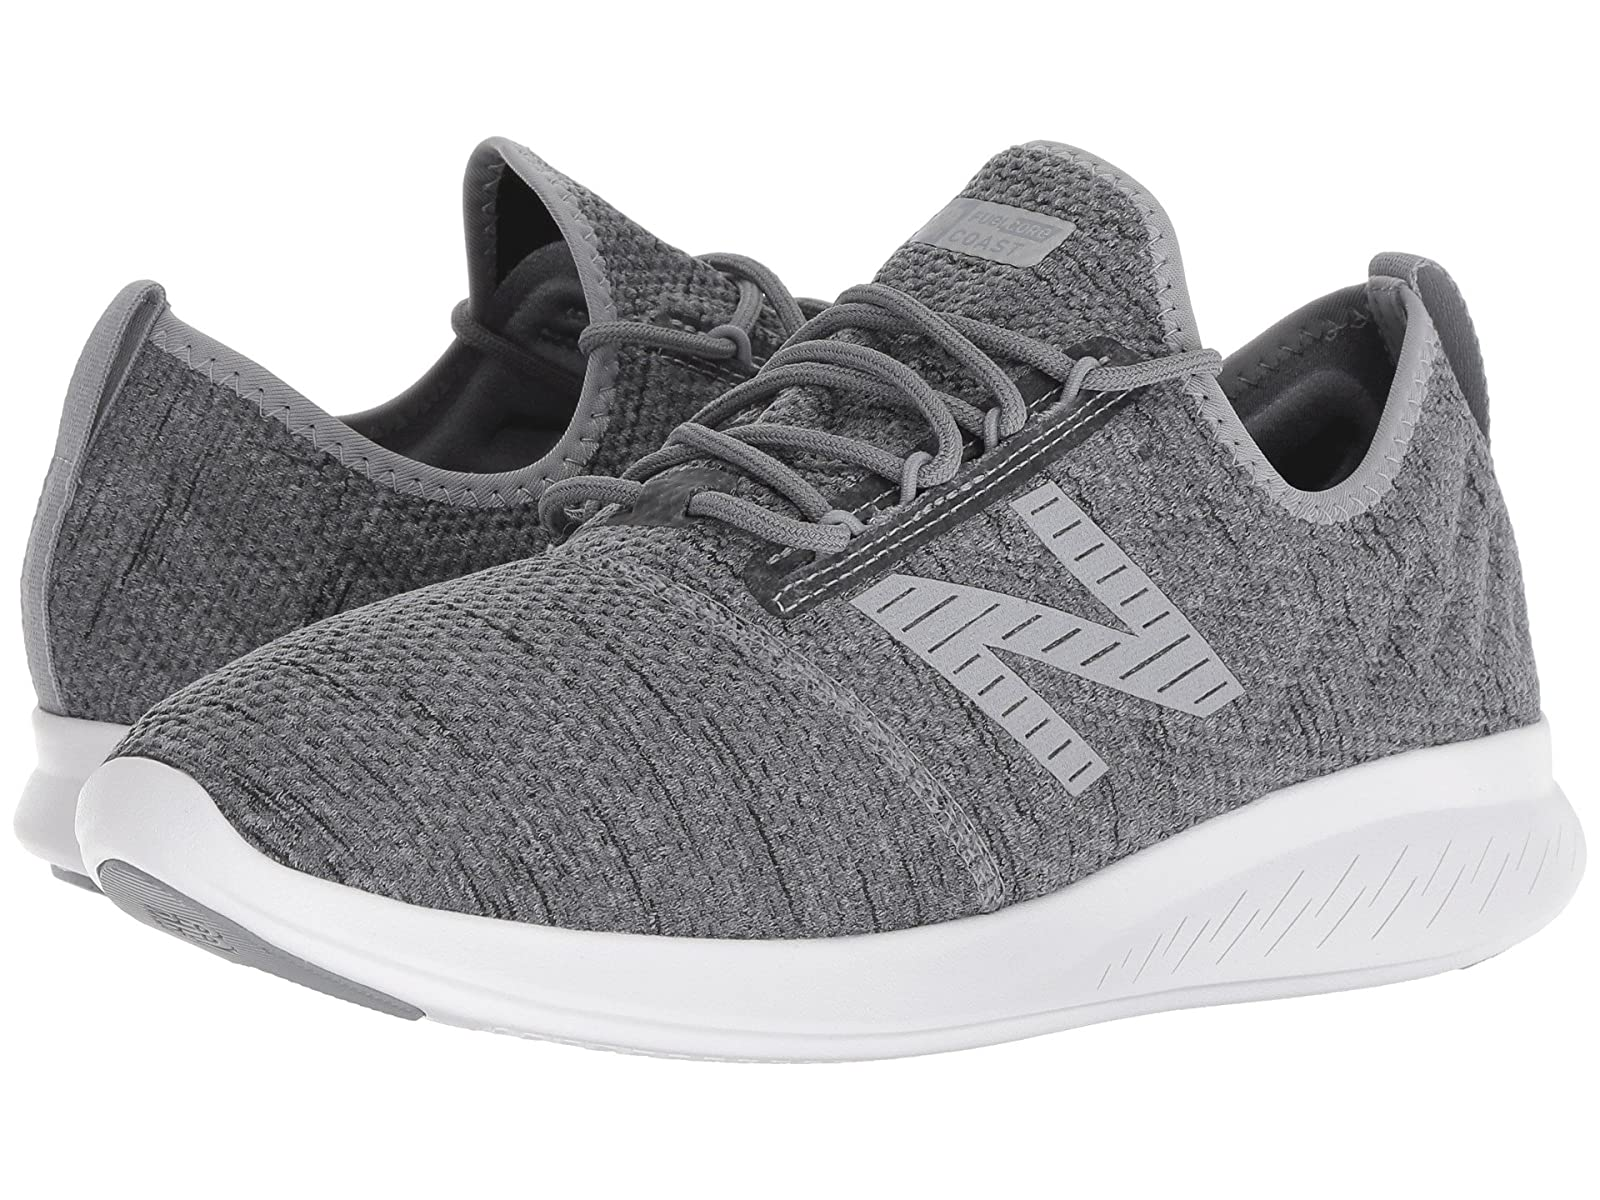 New Balance Coast v4Atmospheric grades have affordable shoes